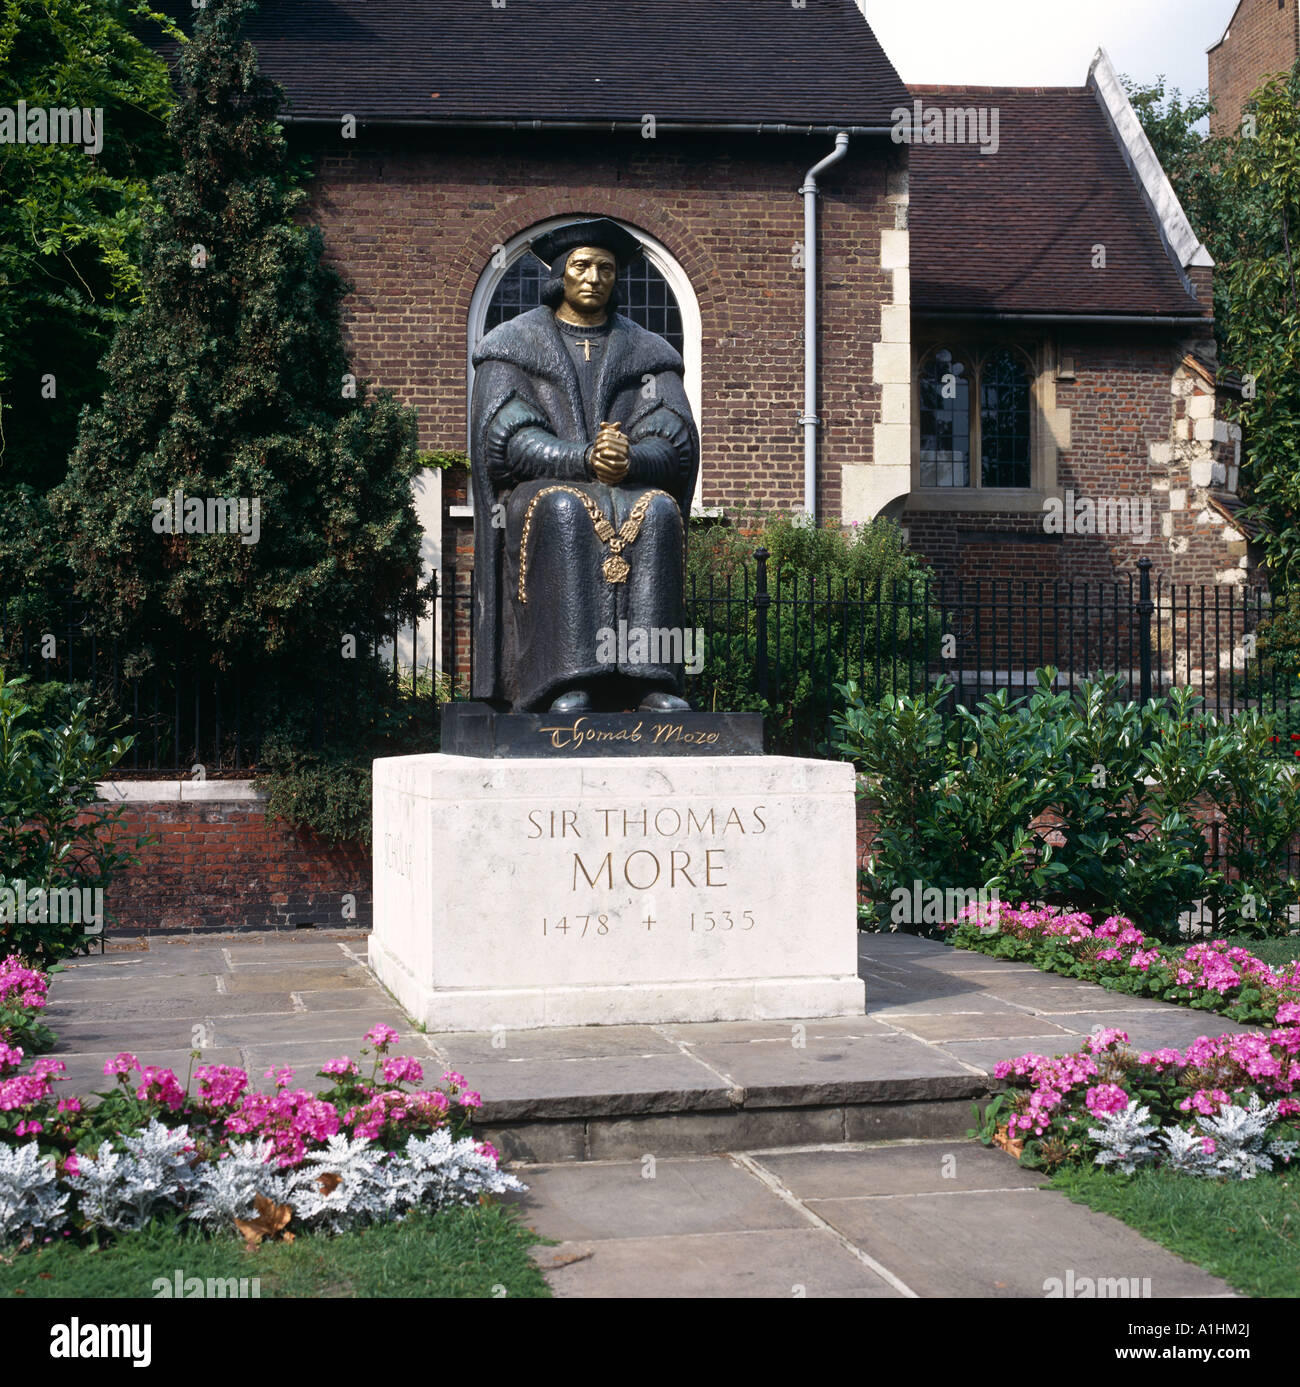 Statue Of Sir Thomas Moore Chelsea Embankment London UK Europe - Stock Image